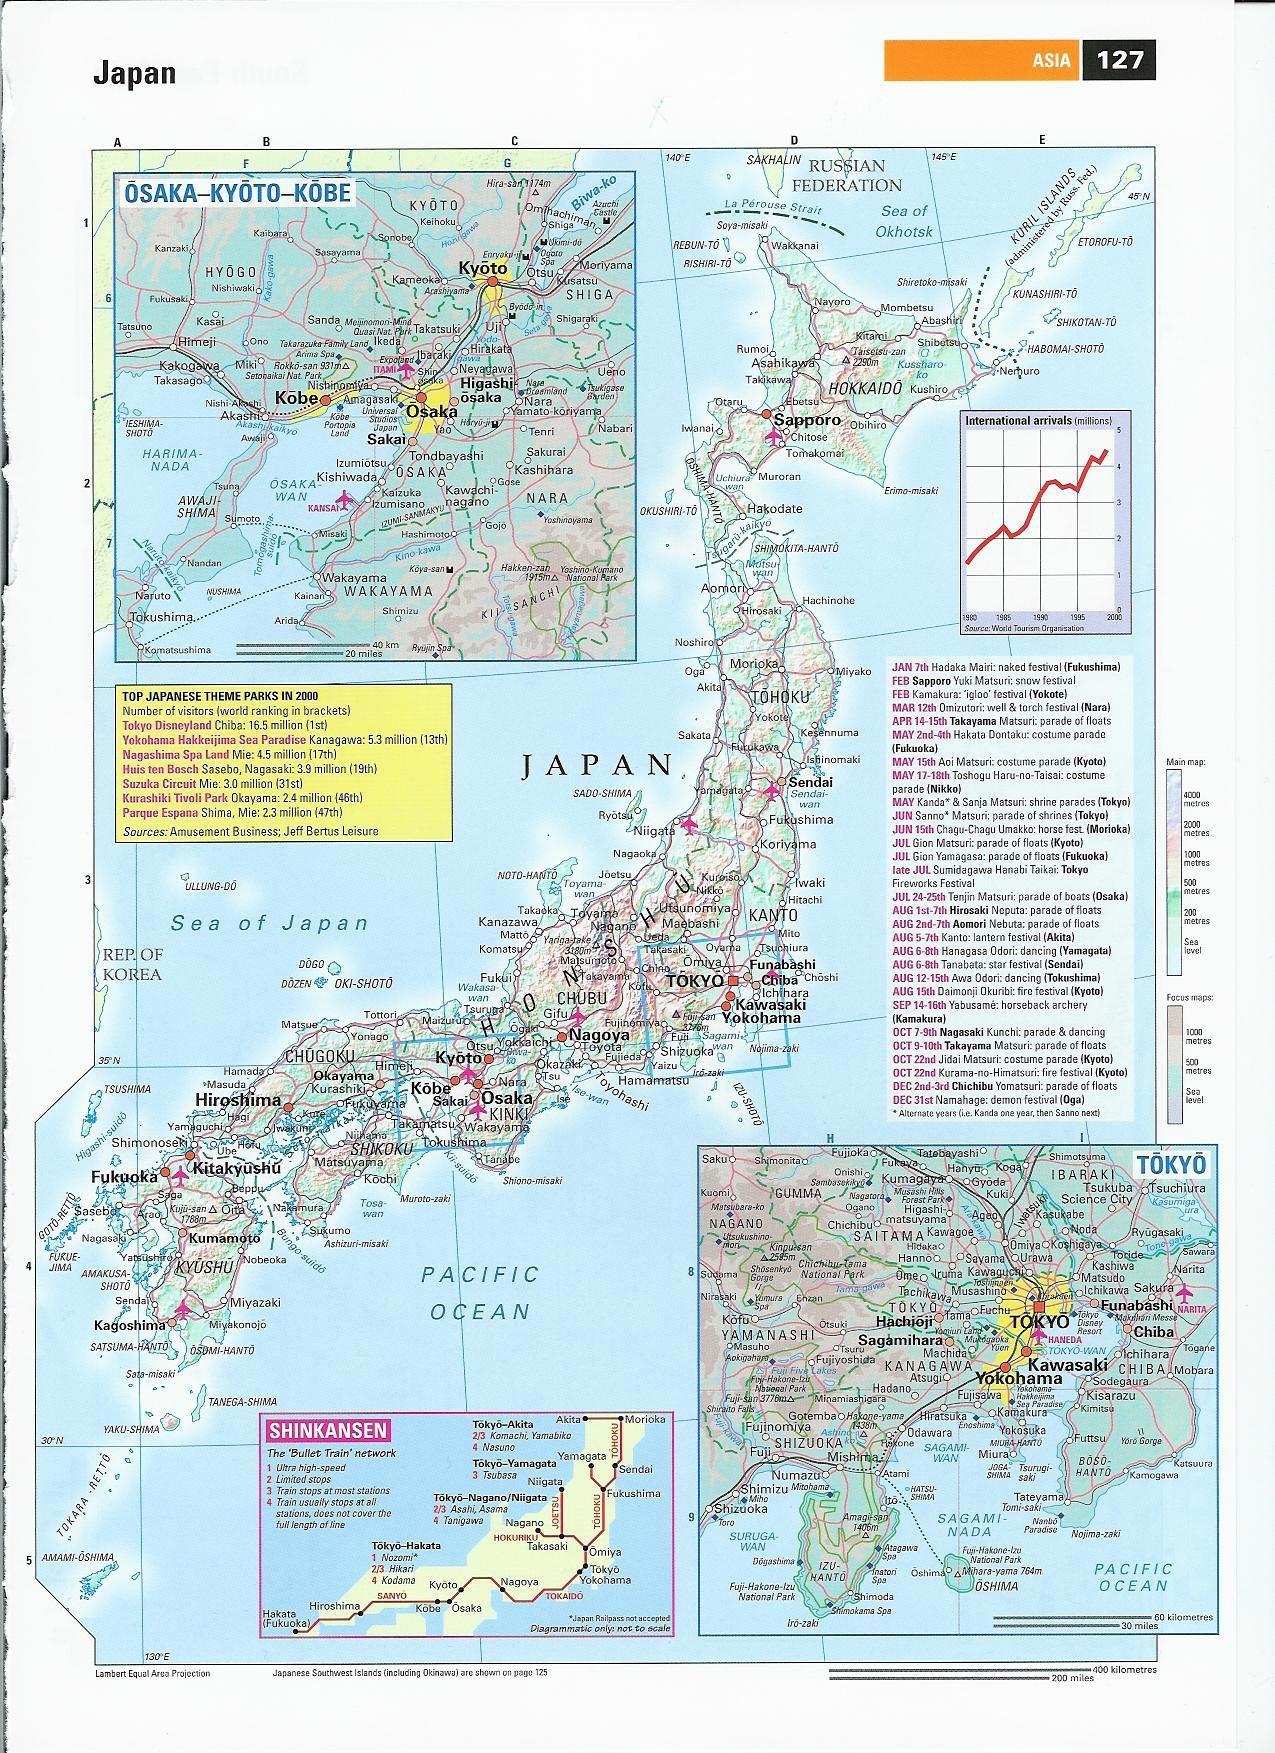 Japan Maps | Printable Maps Of Japan For Download - Free Printable Map Of Japan